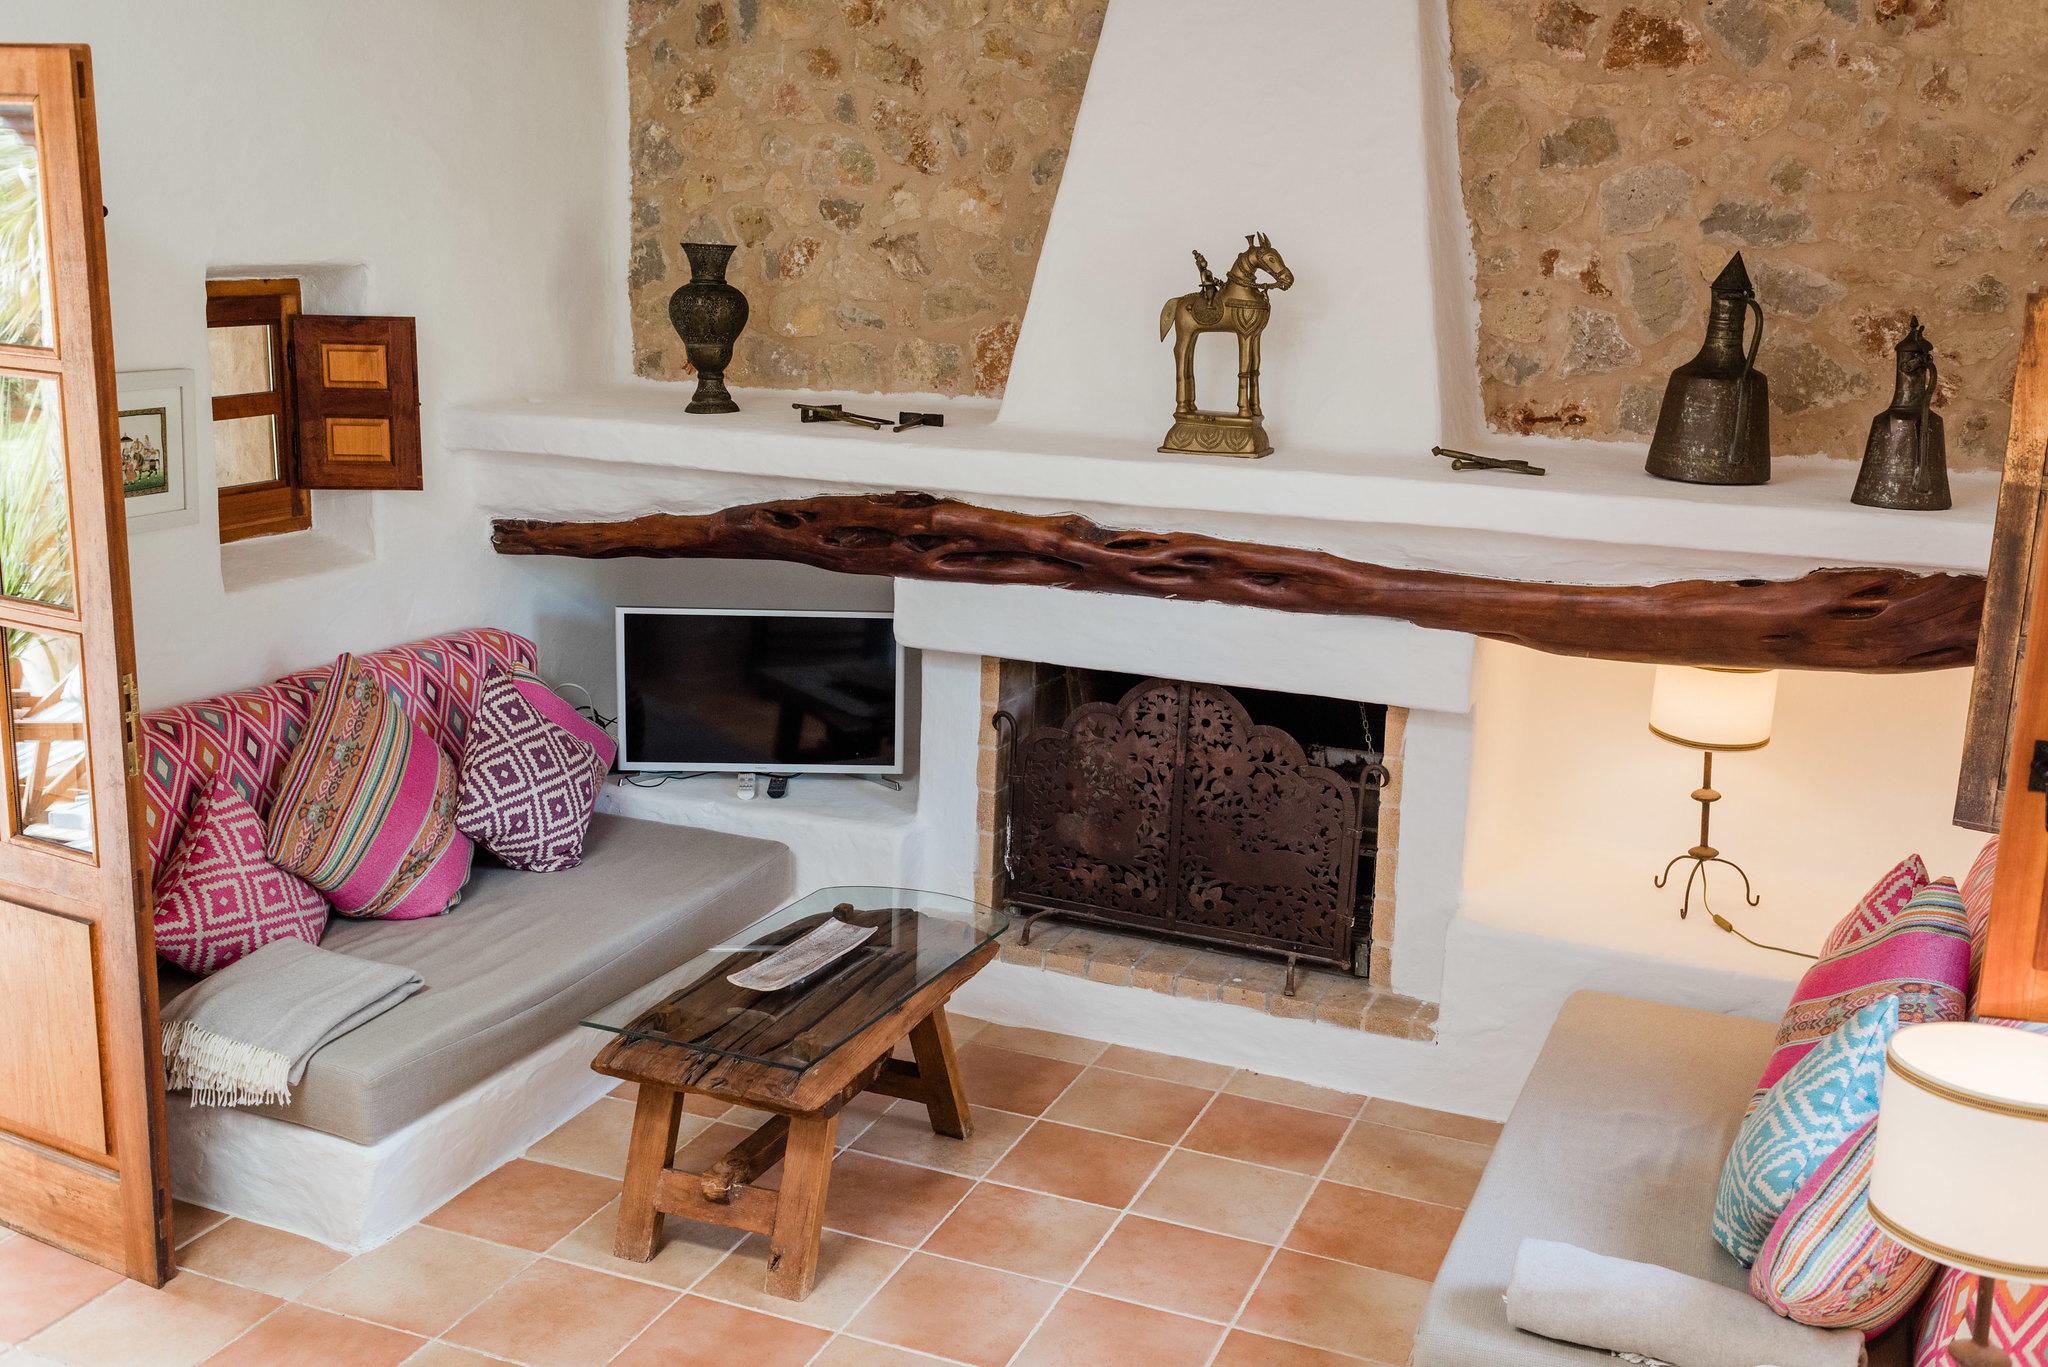 https://www.white-ibiza.com/wp-content/uploads/2020/05/white-ibiza-villas-can-sabina-interior-living-room.jpg